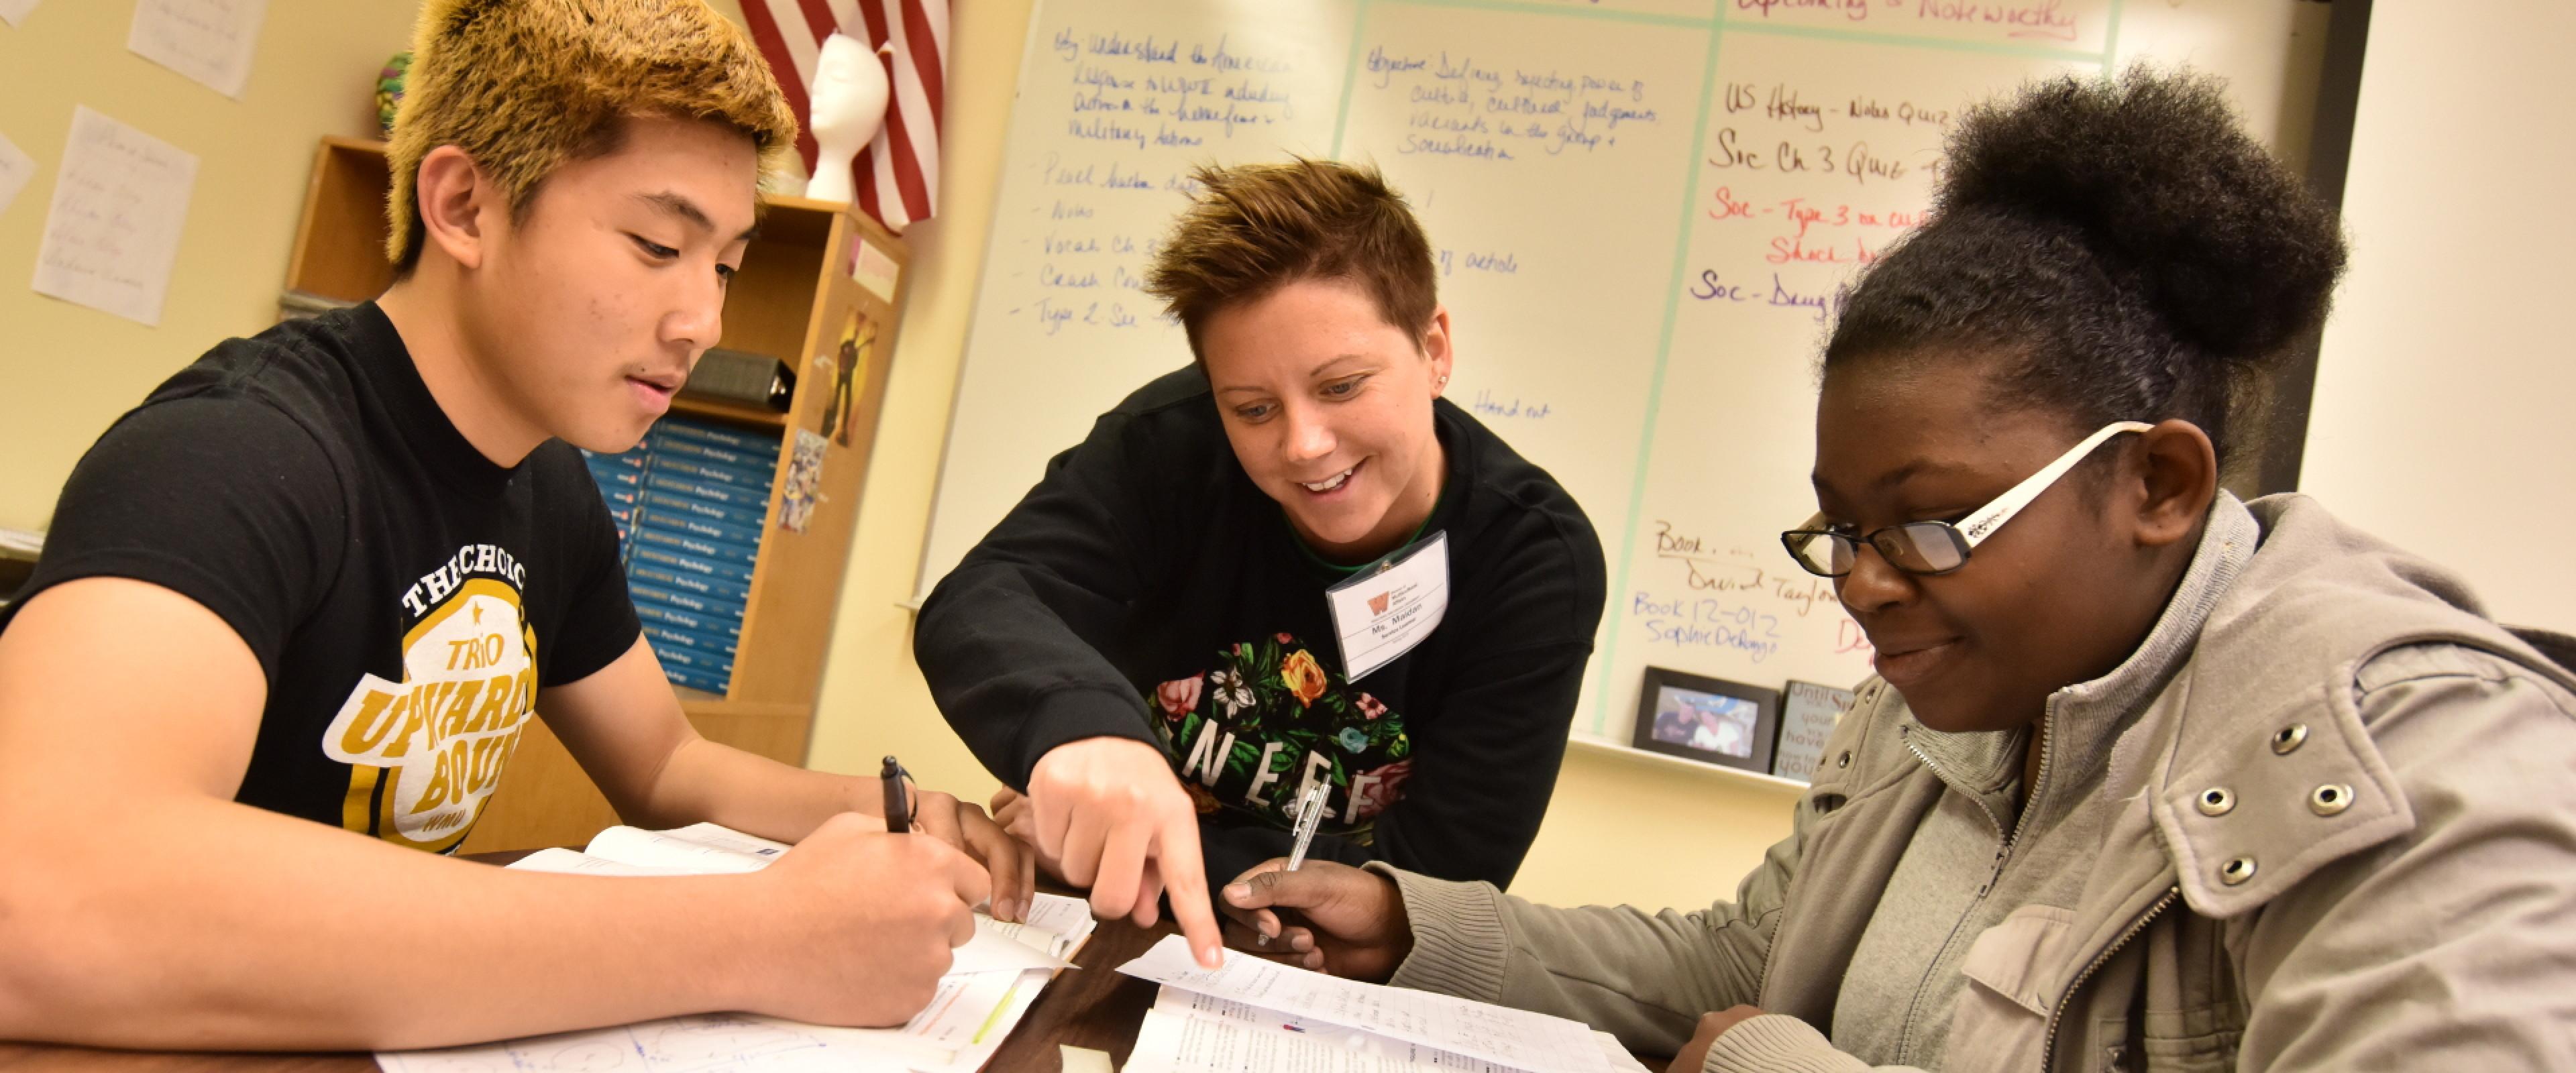 Two students being tutored through Upward Bound's tutoring program.